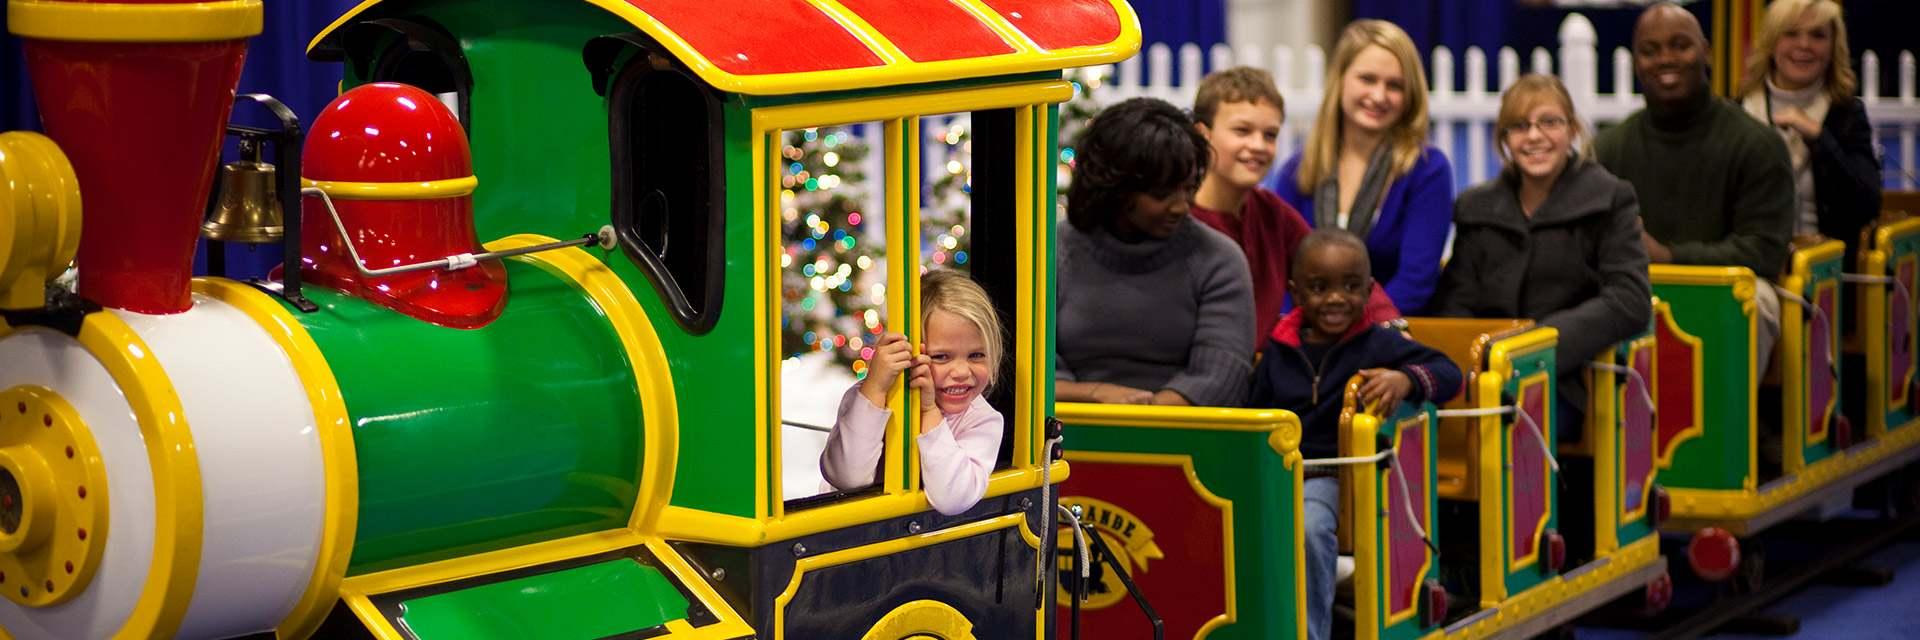 Gaylord National Maryland Village Express Kids Train